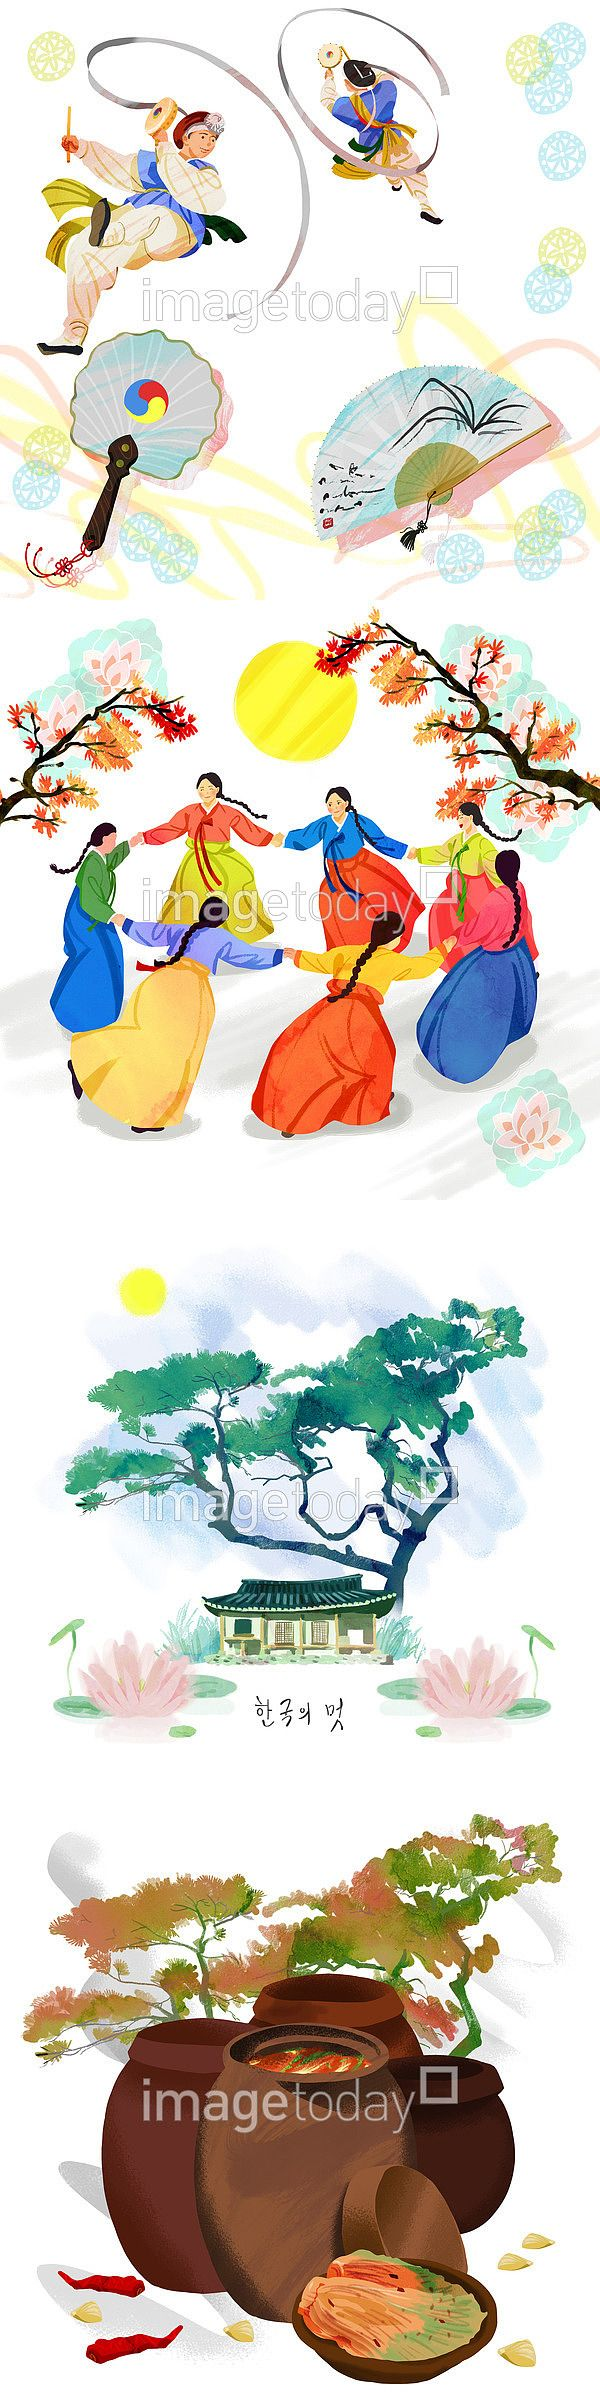 PSD 고추 김장 김치 나무 발효 배추김치  소나무 오브젝트 음식 장독 전통 컨셉 페인터 한국 한국전통 한식 라이프스타일 명절 문화 미소 민속놀이 보름달 PSD pepper kimchi fermented cabbage kimchi pine wood objects food pots tradition traditional Korean lifestyle concept Painter Korea Korean culture festival folk plays smile full moon #이미지투데이 #imagetoday #클립아트코리아 #clipartkorea #통로이미지 #tongroimages